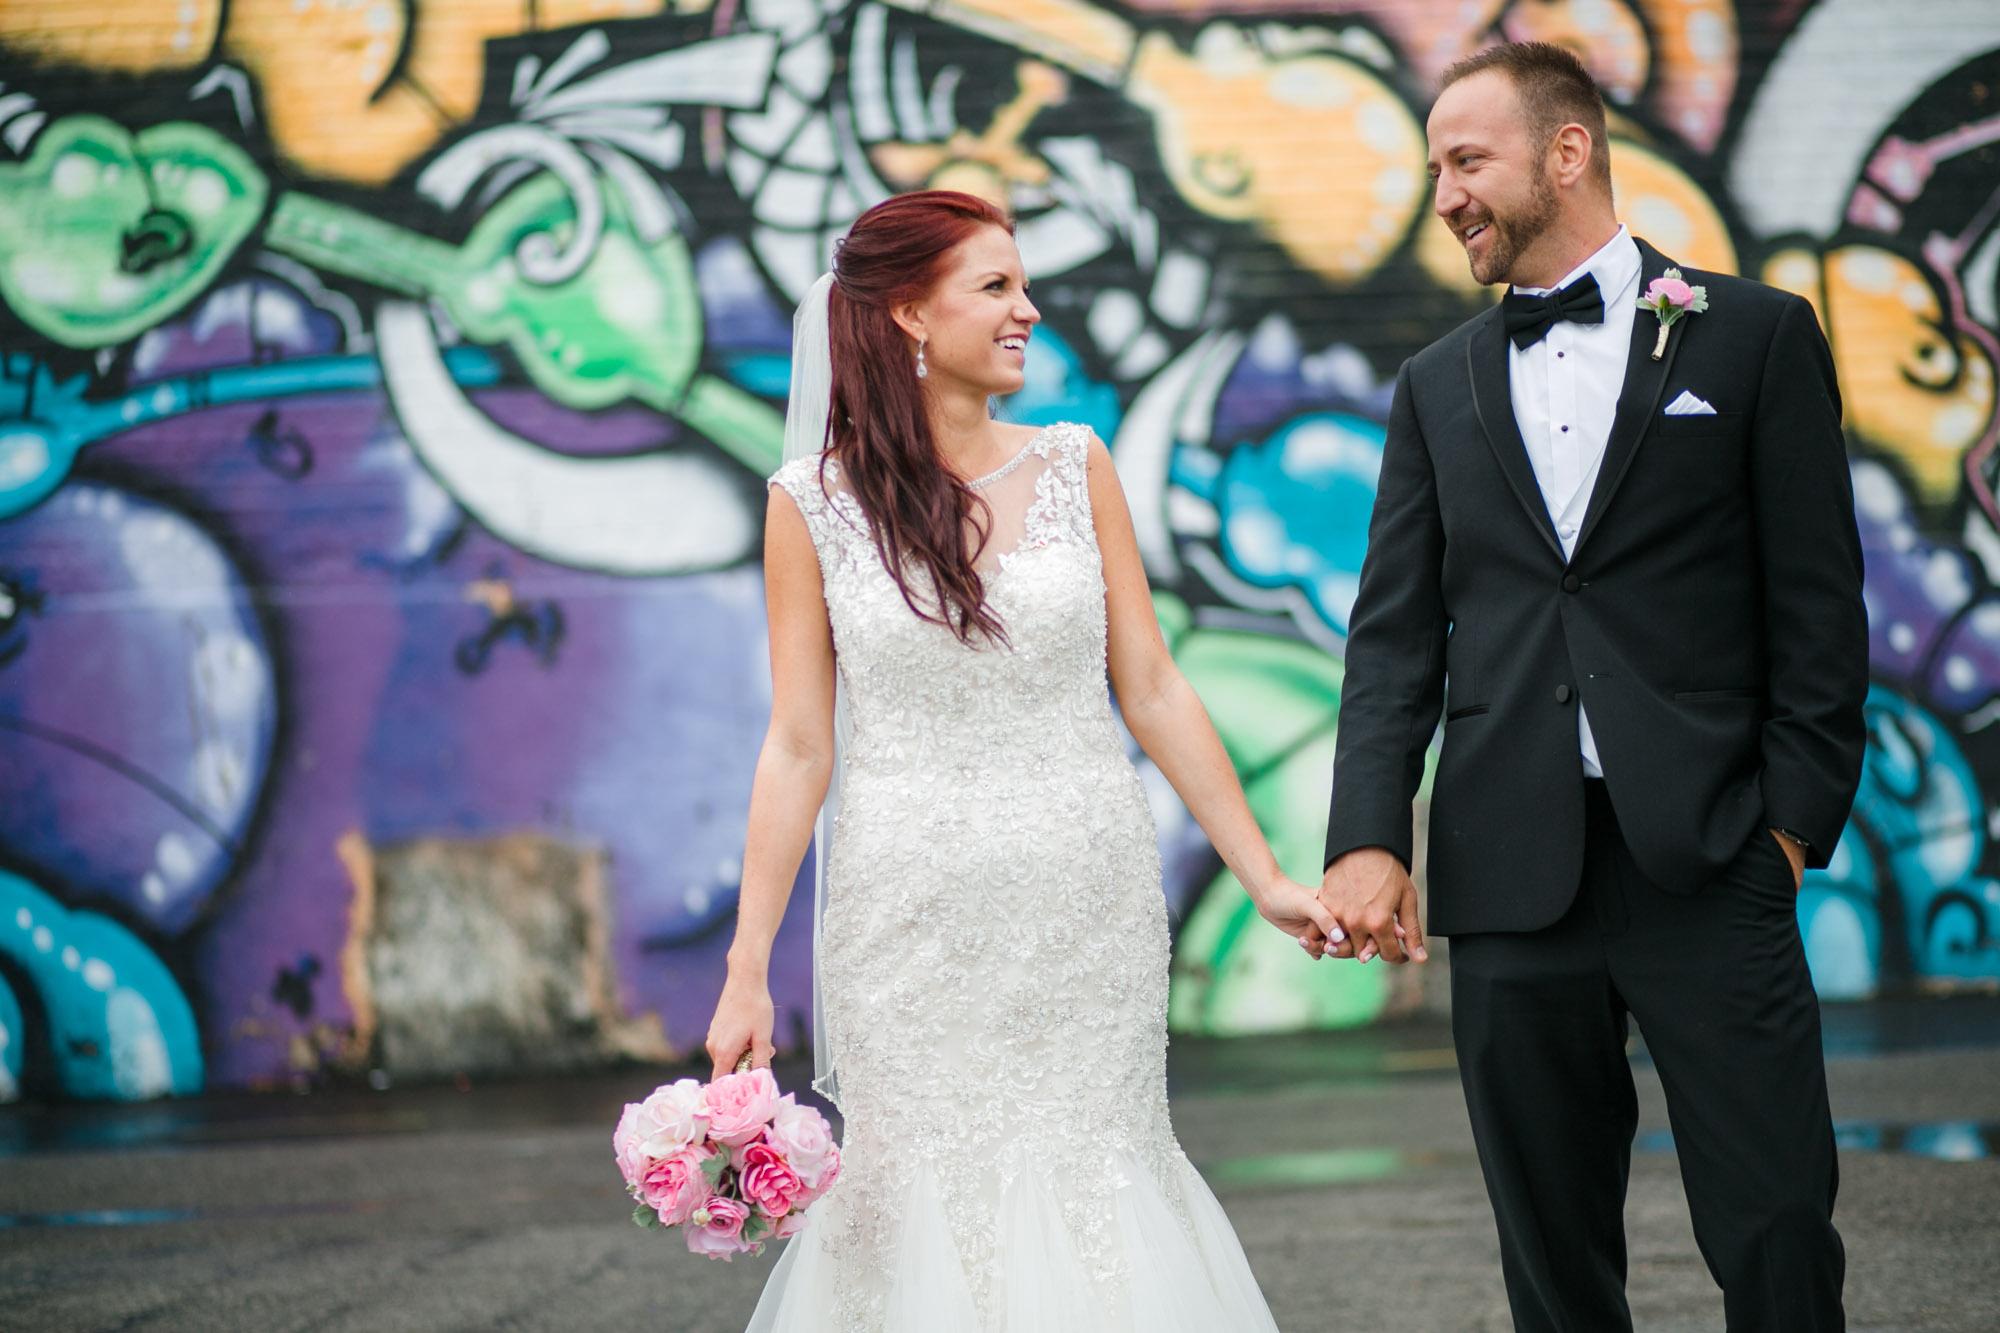 hensville-wedding-downtown-toledo-ohio (66 of 103).jpg